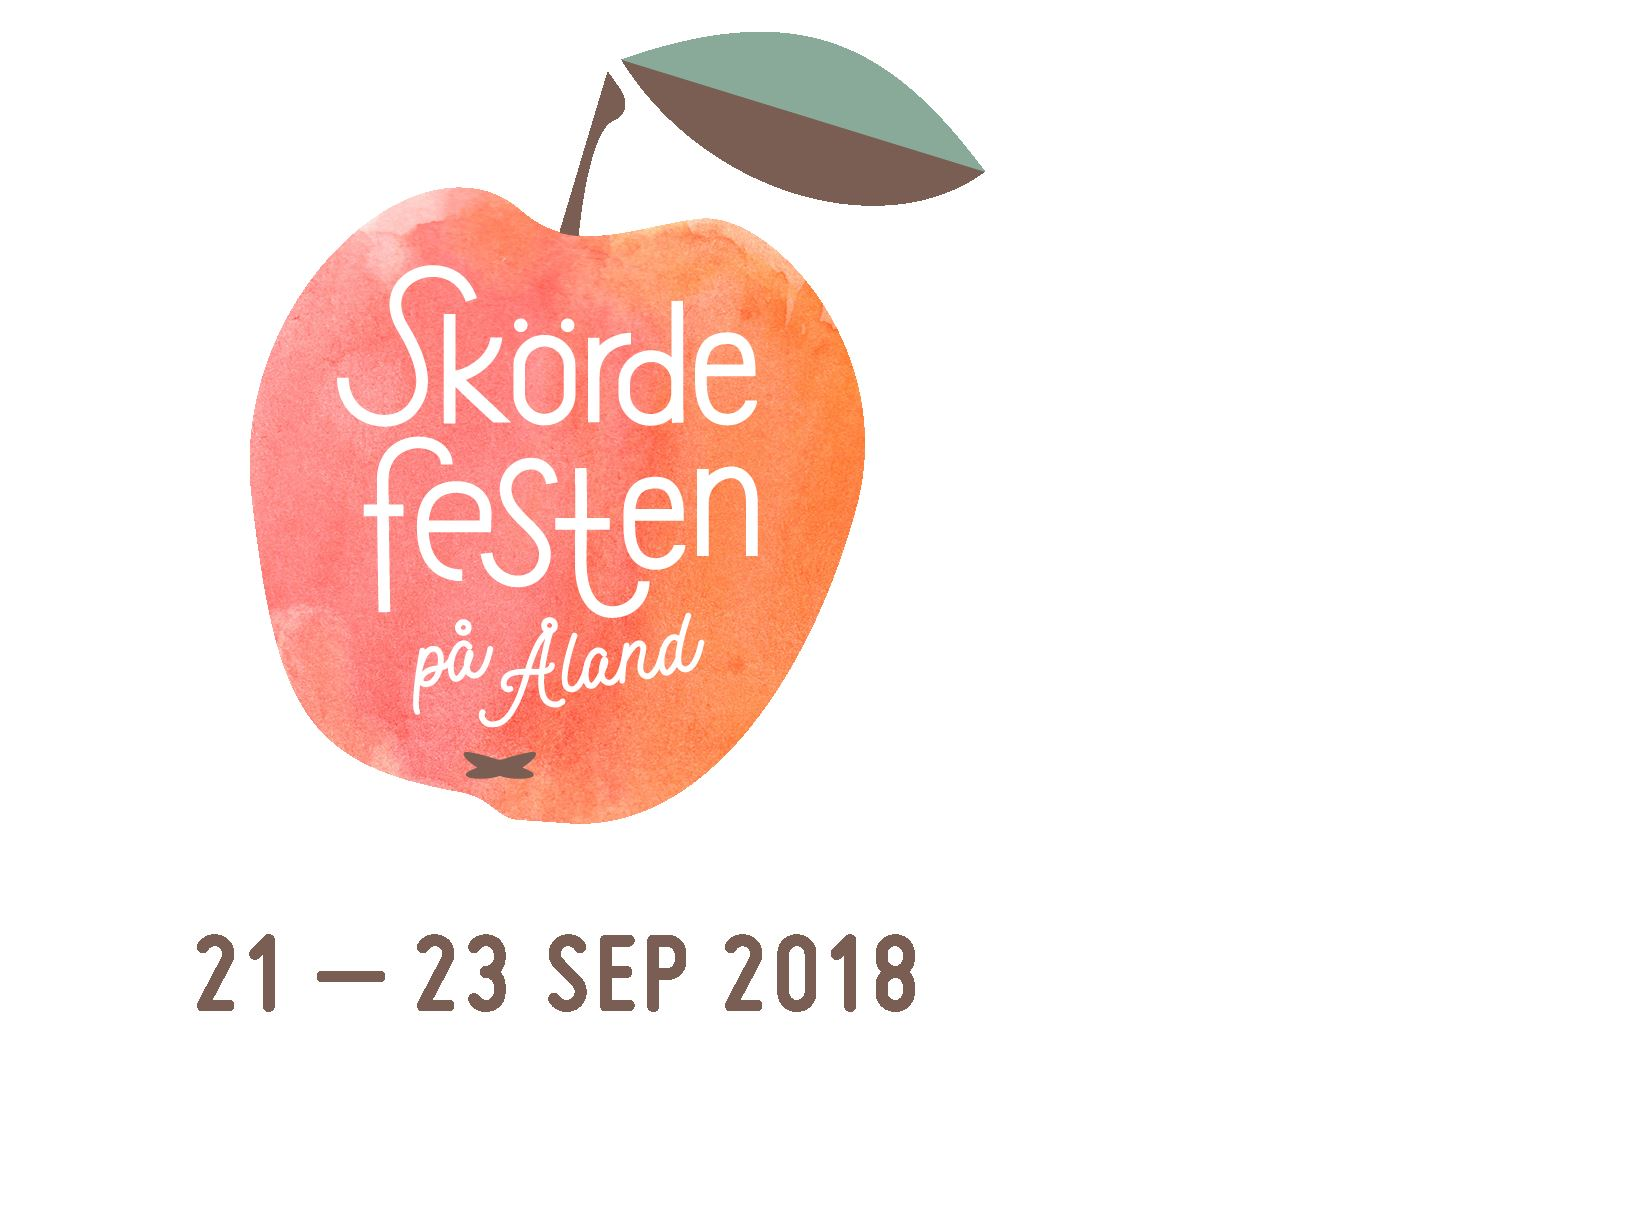 Åland Harvest Festival 2018